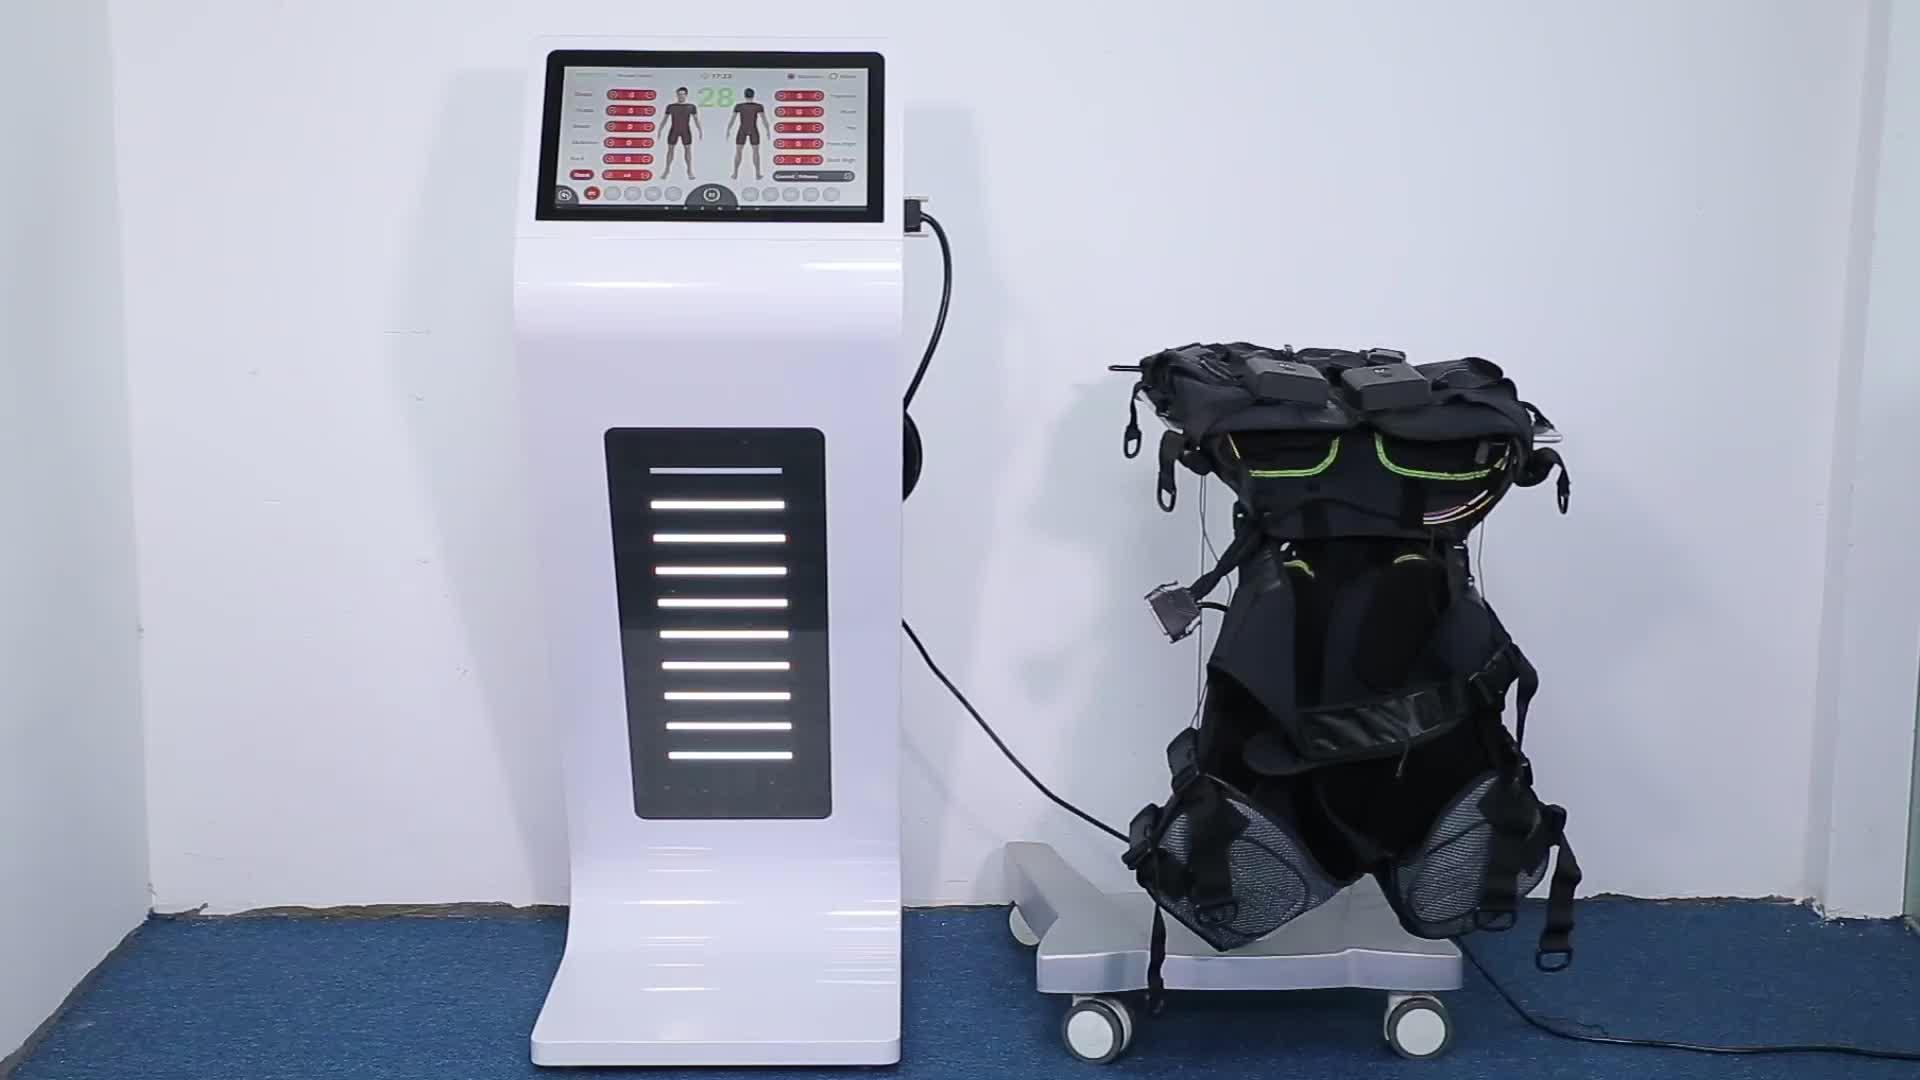 SBODY Electroestimulador ems トレーニングスーツ/ワイヤレス ems フィットネスマシン